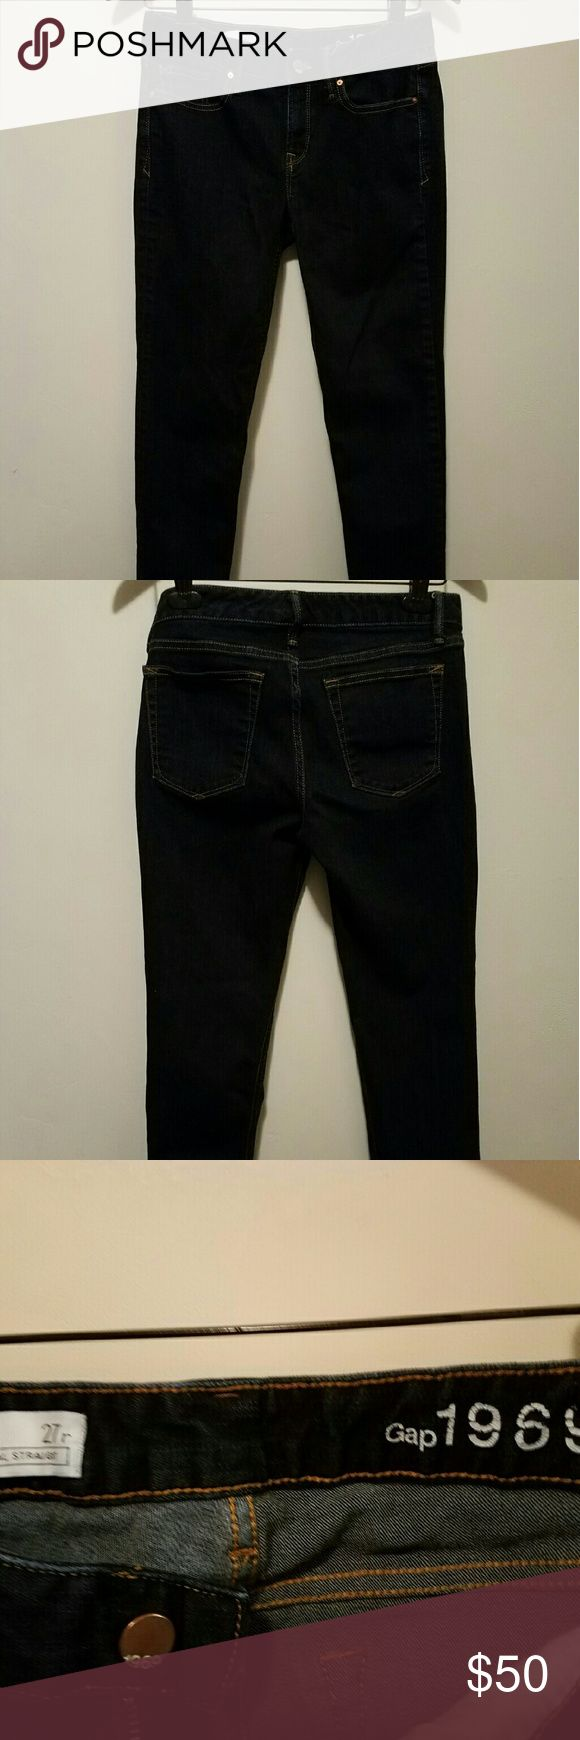 Gap women's jeans Gap original 1969 real straight. Size 27 regular. GAP Jeans Straight Leg